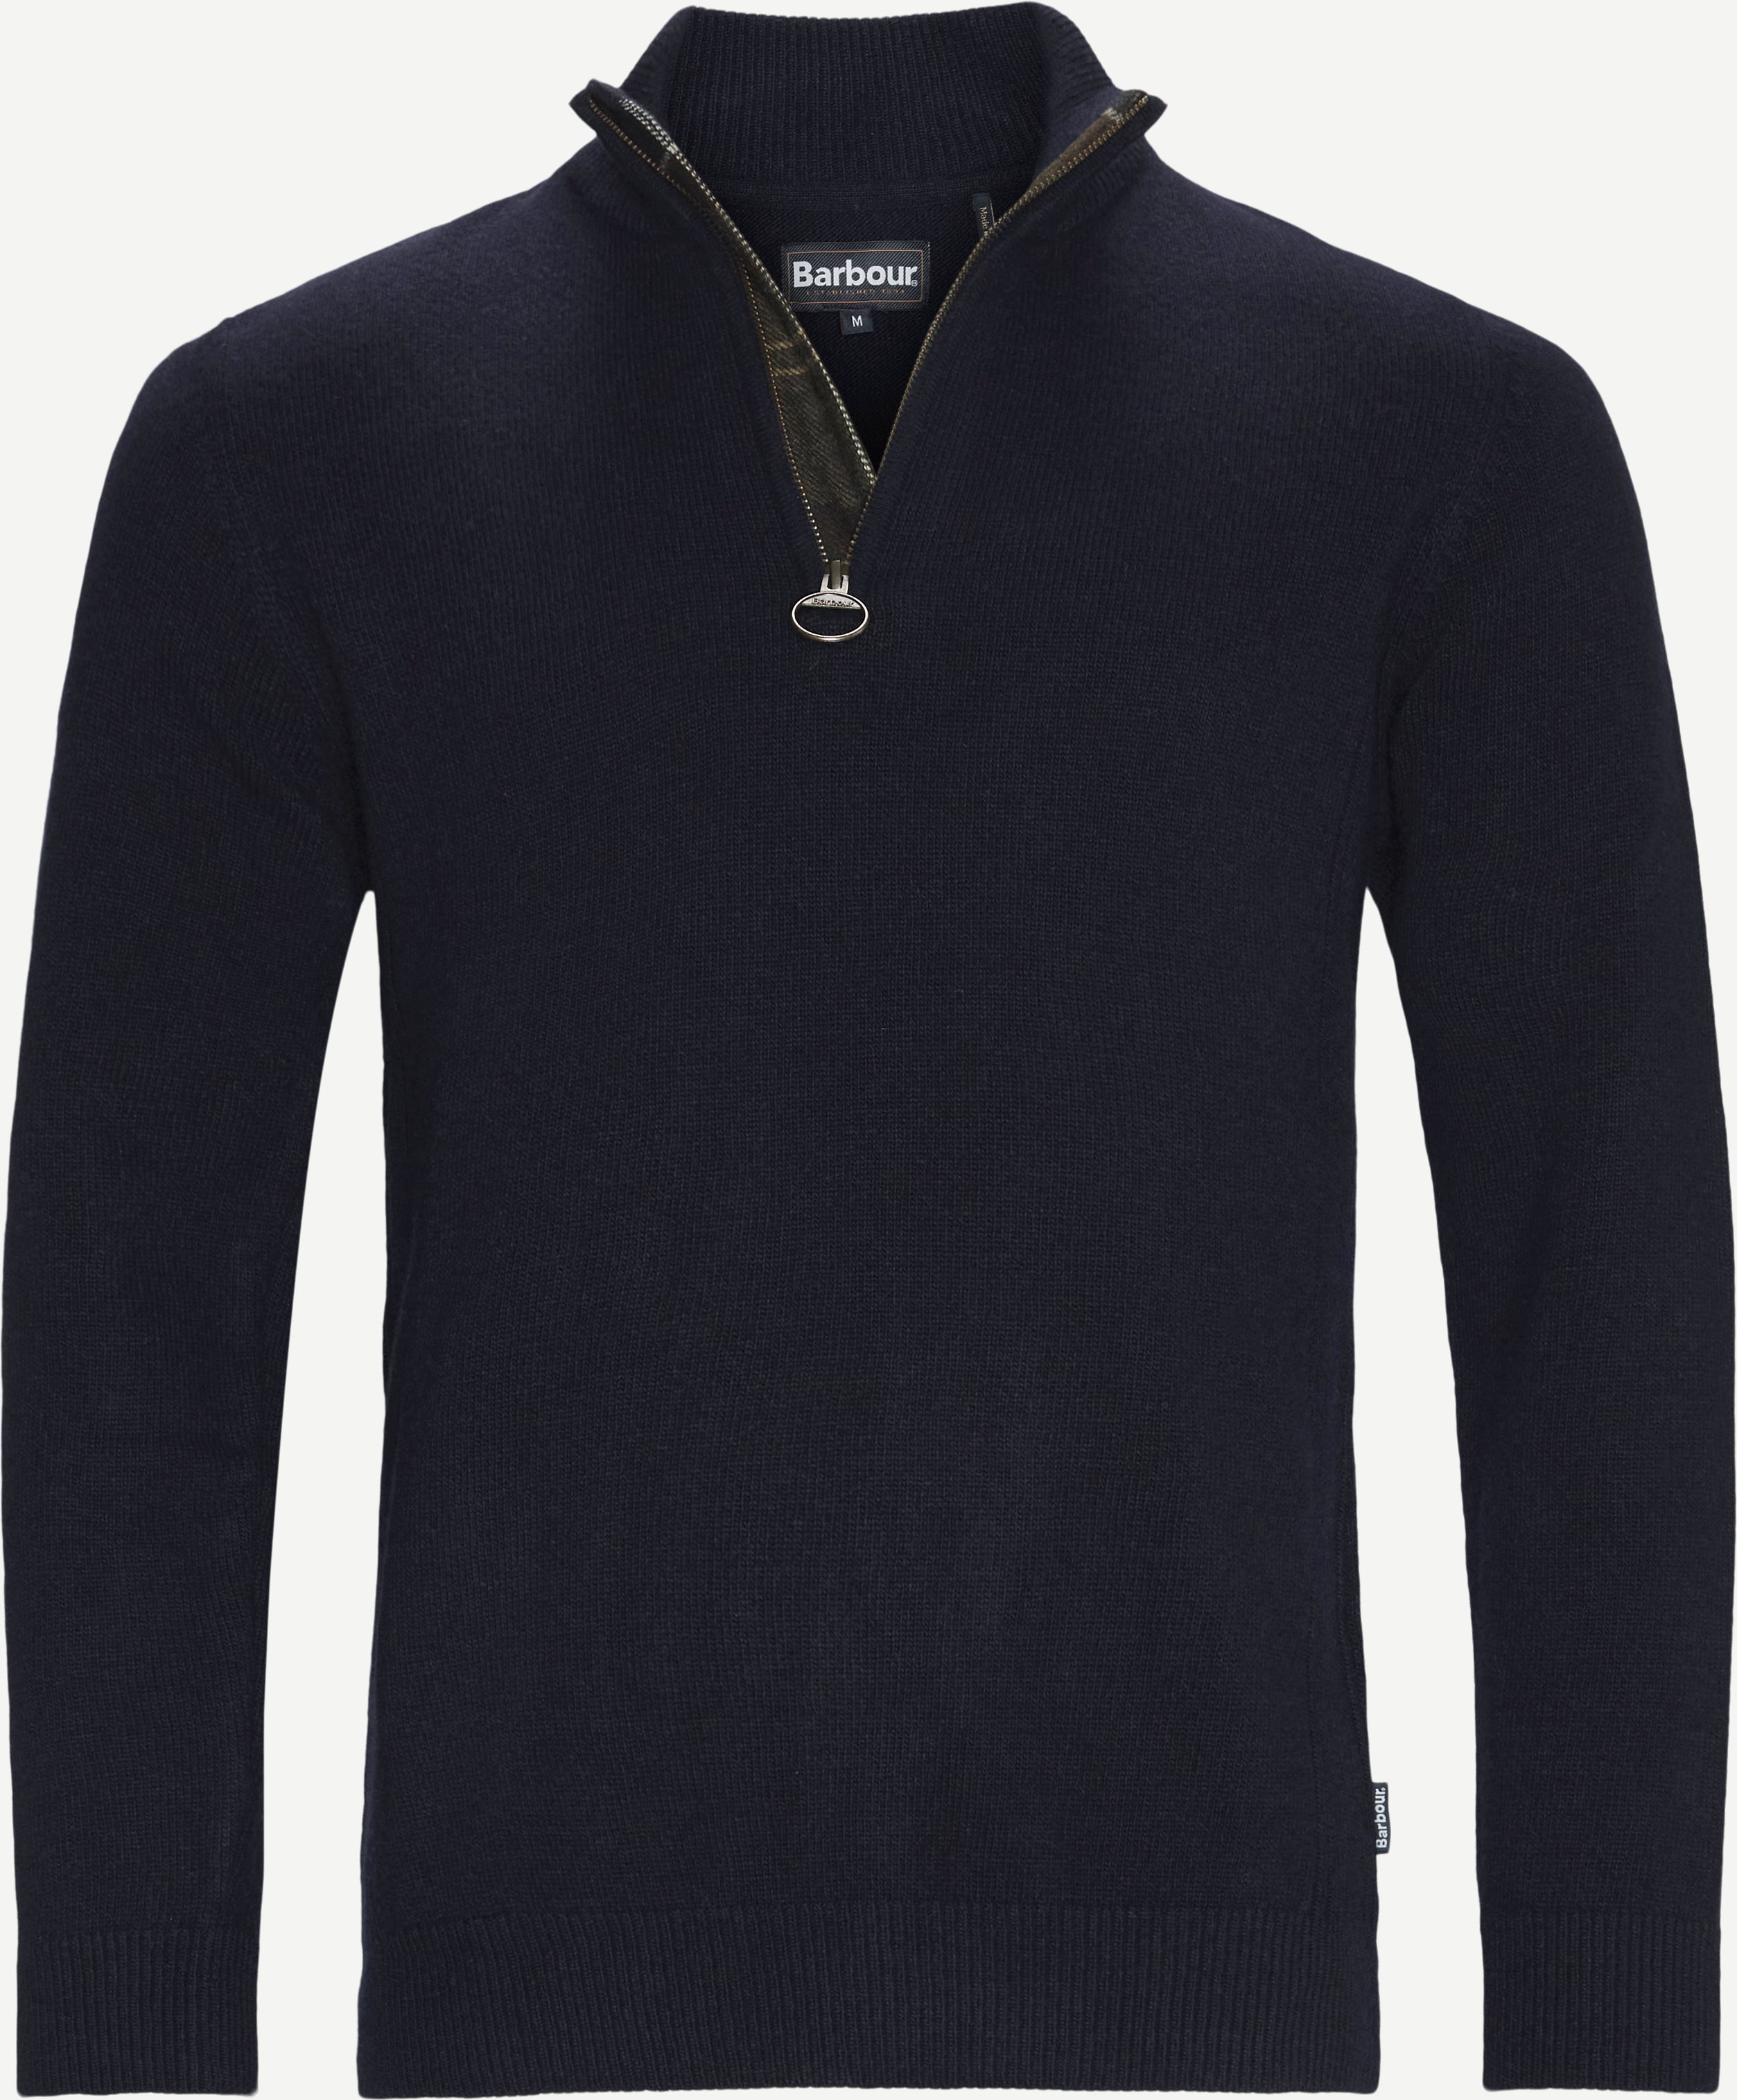 Strickwaren - Regular fit - Blau